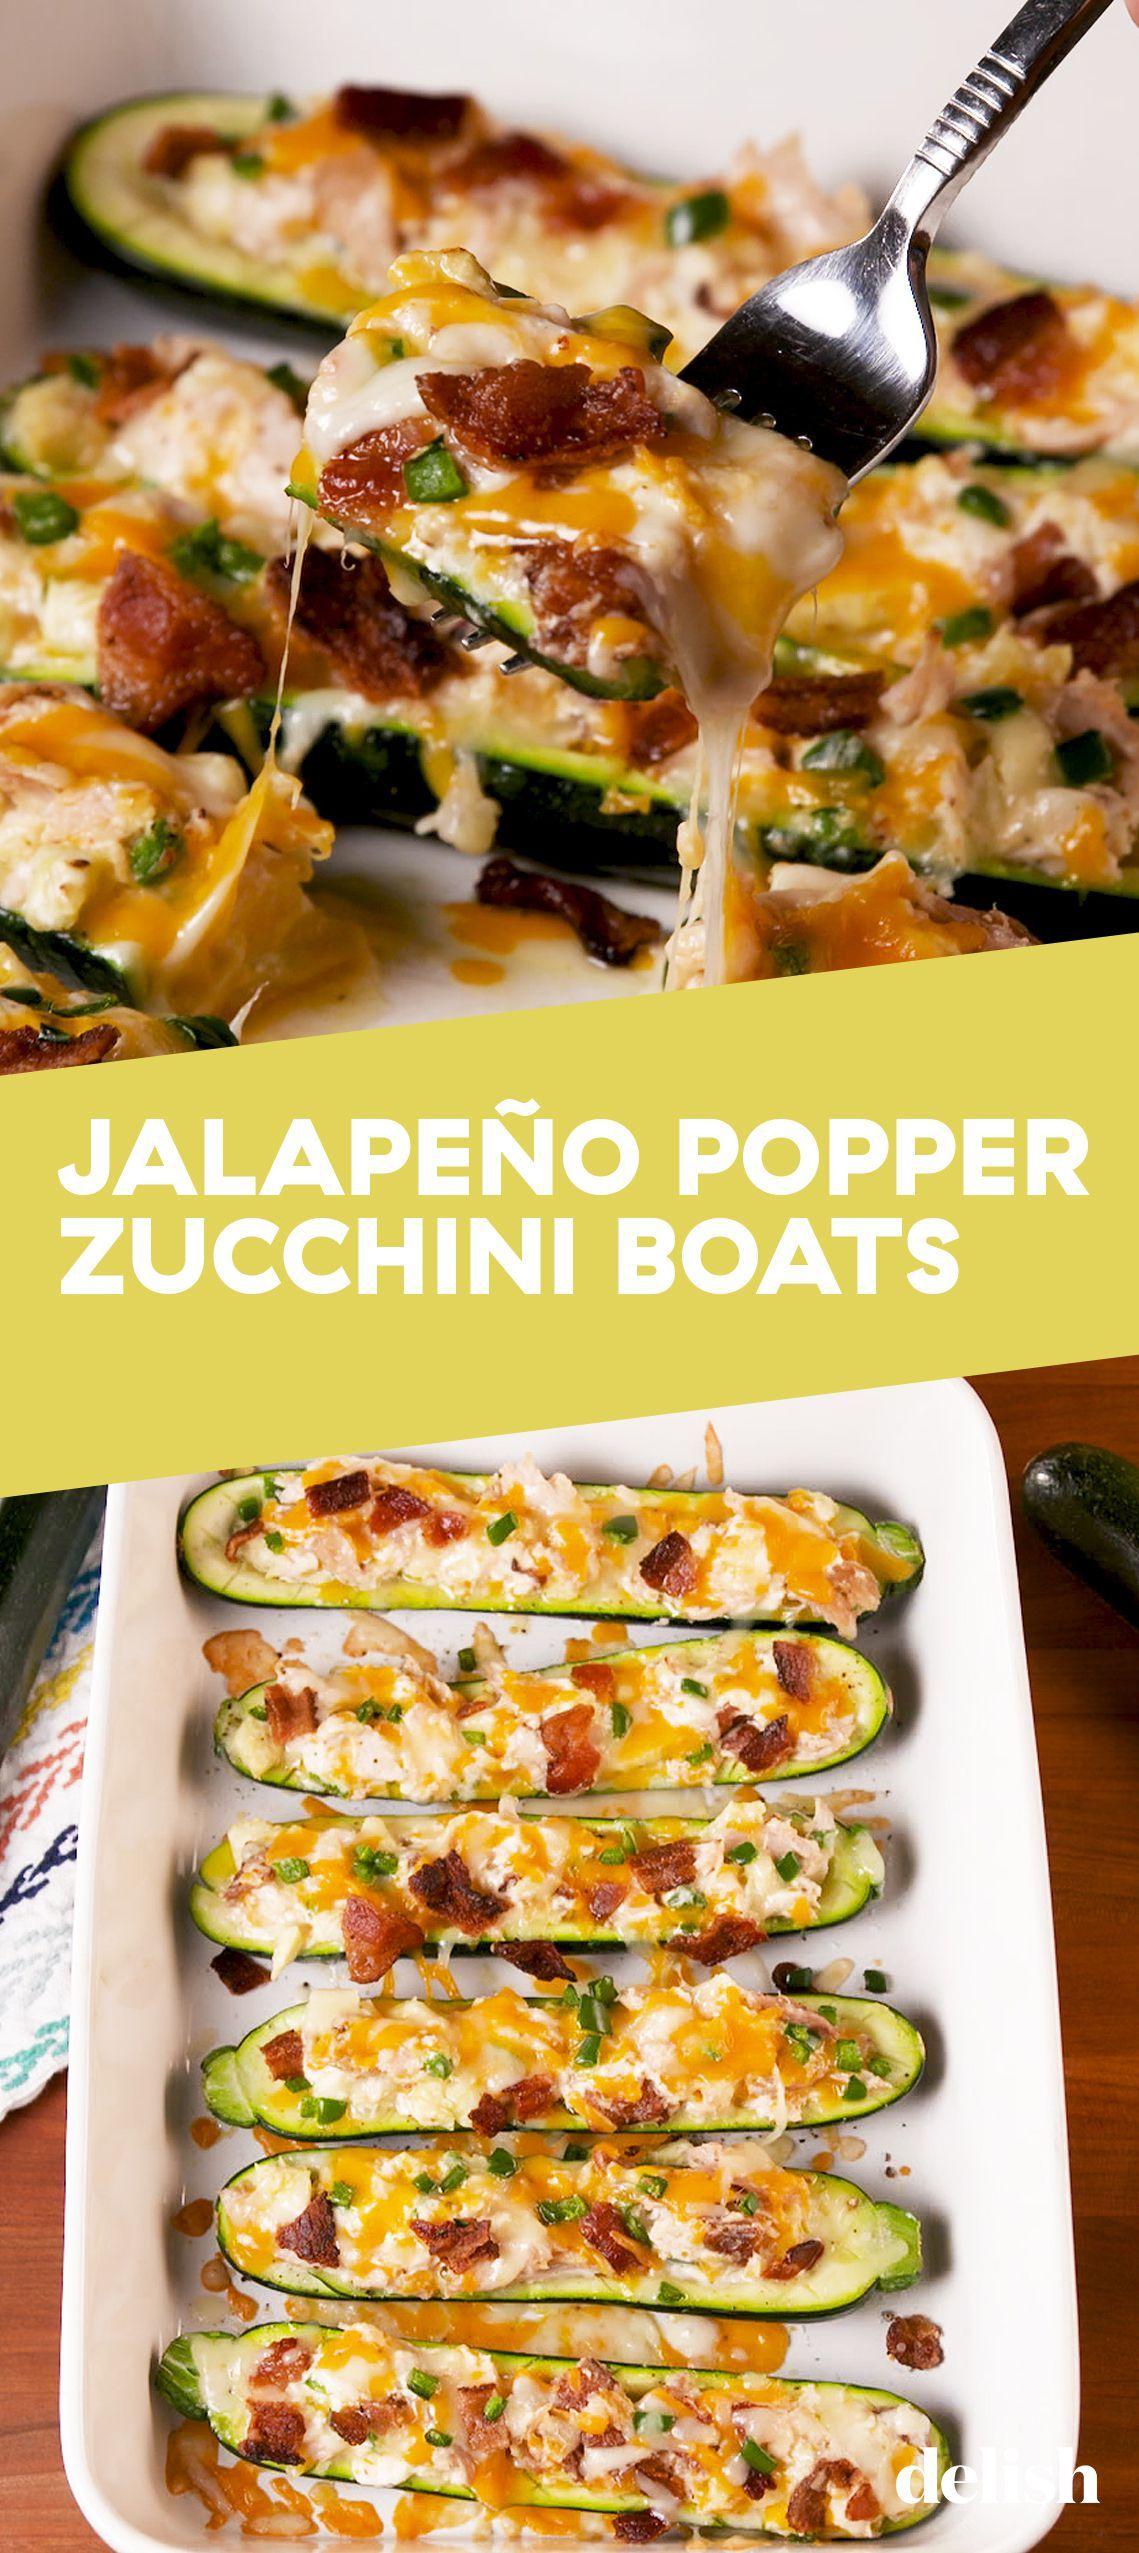 Jalapeño Popper Zucchini Boats #lowcarbrecipes